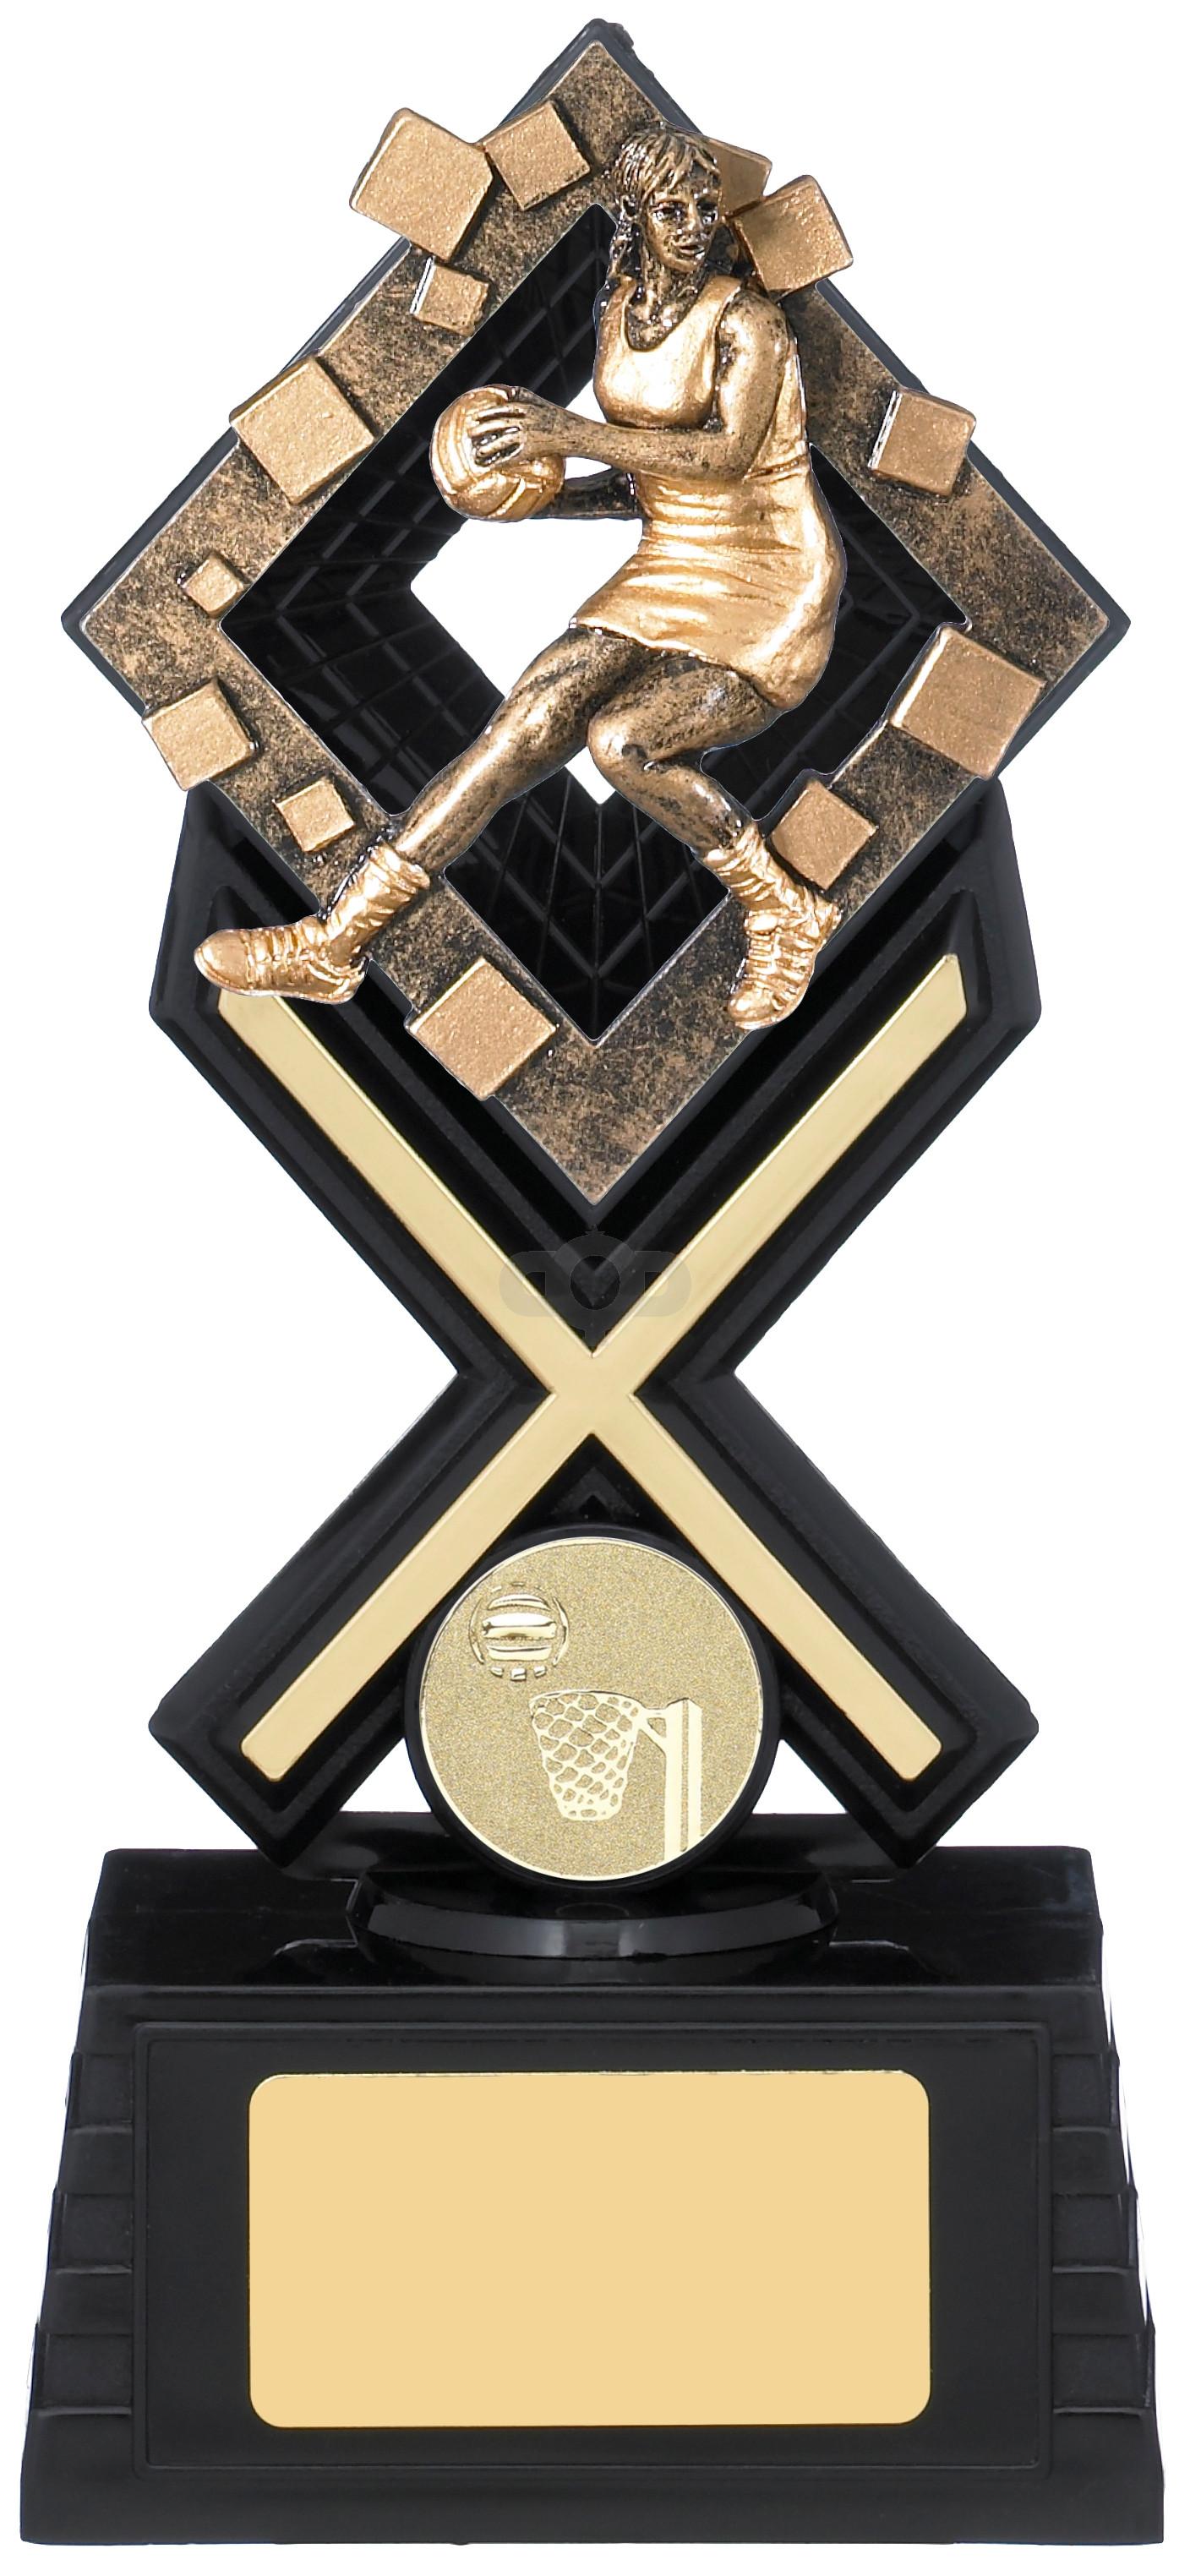 Activ8 Netball Award